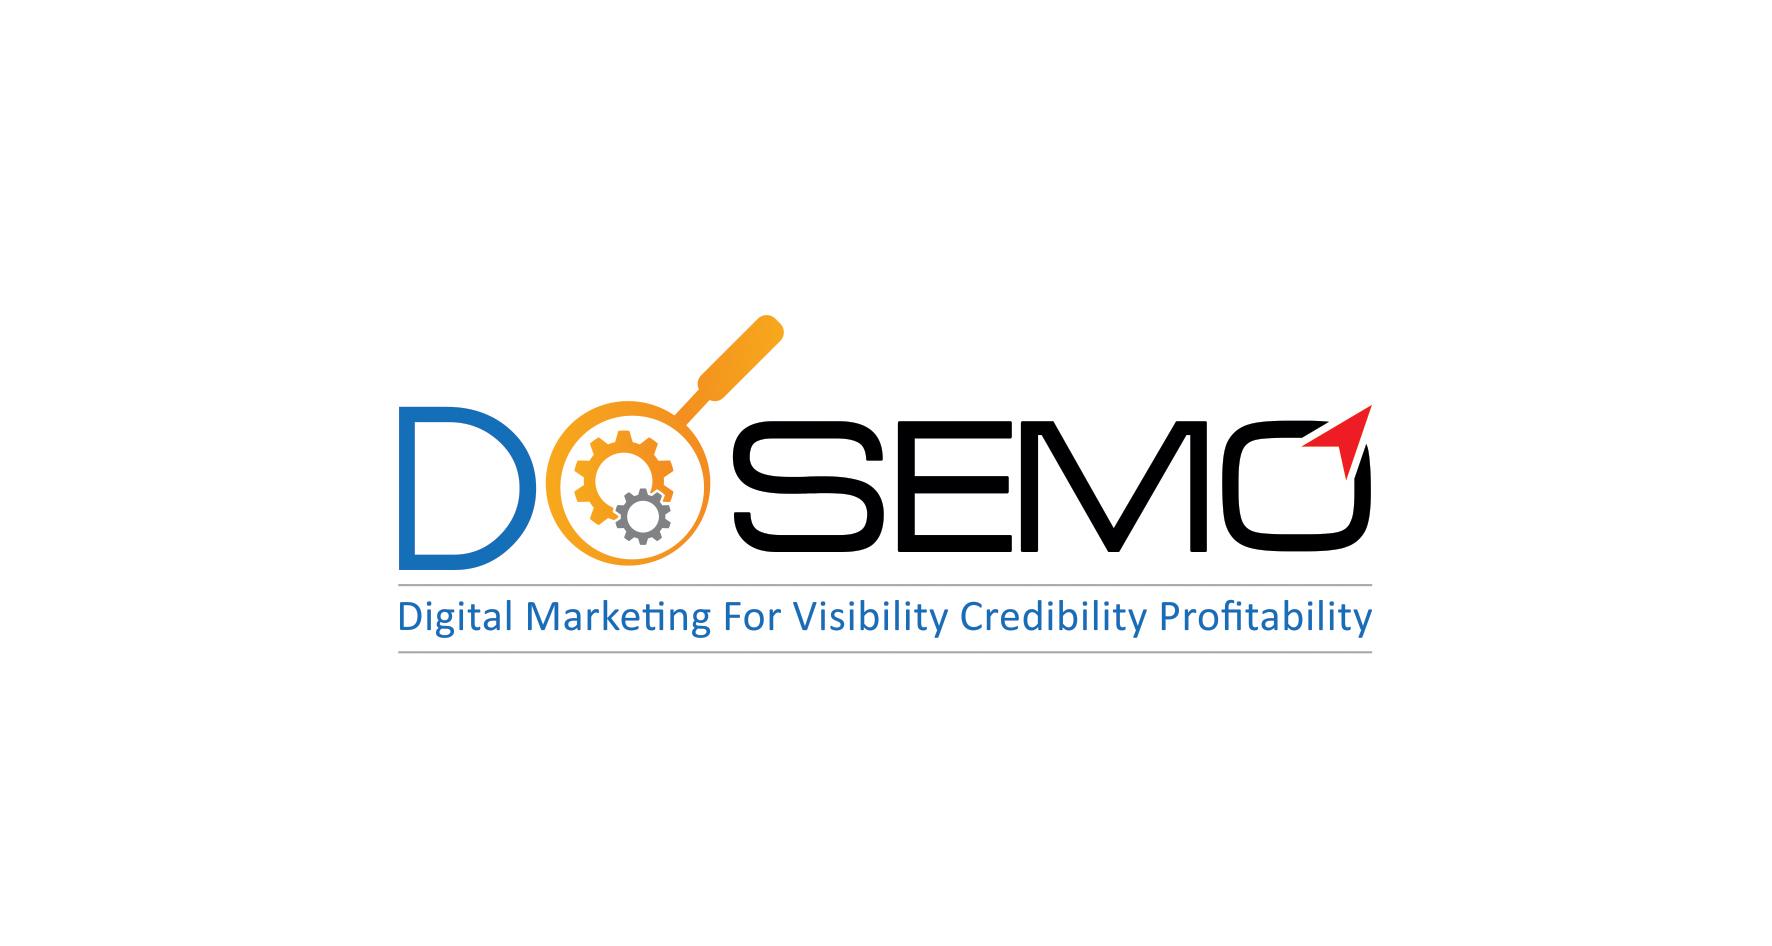 Dosemo Technologies